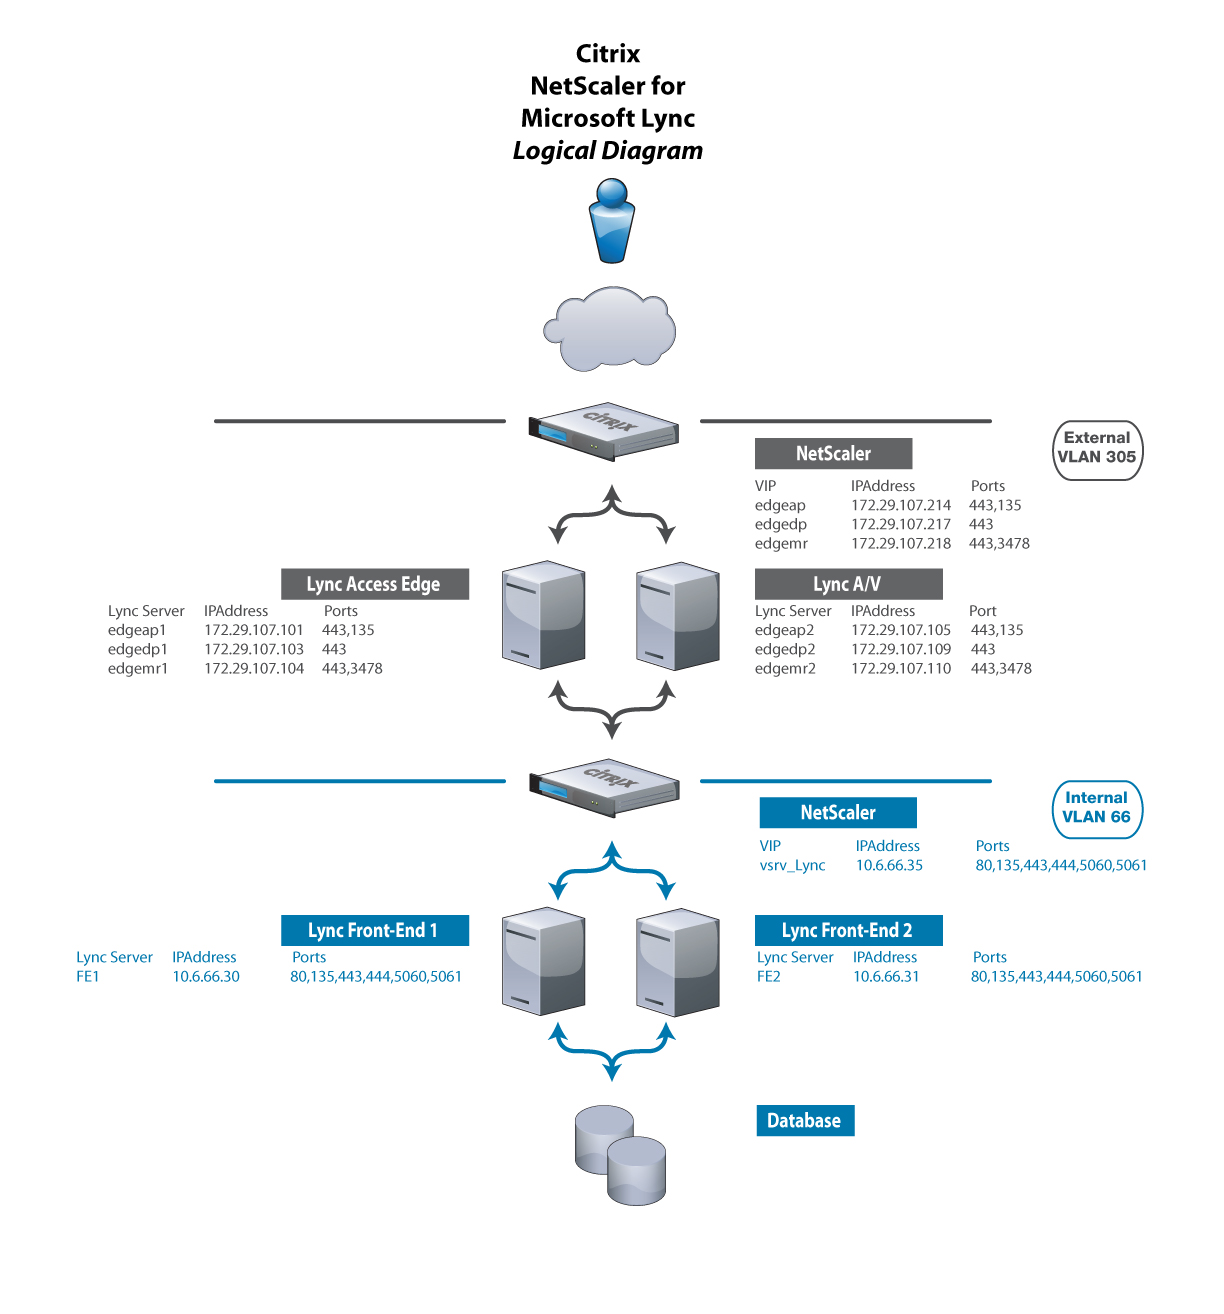 citrix architecture diagram 2008 ford ranger fuse box ryan betts cloud solutions architect configuring